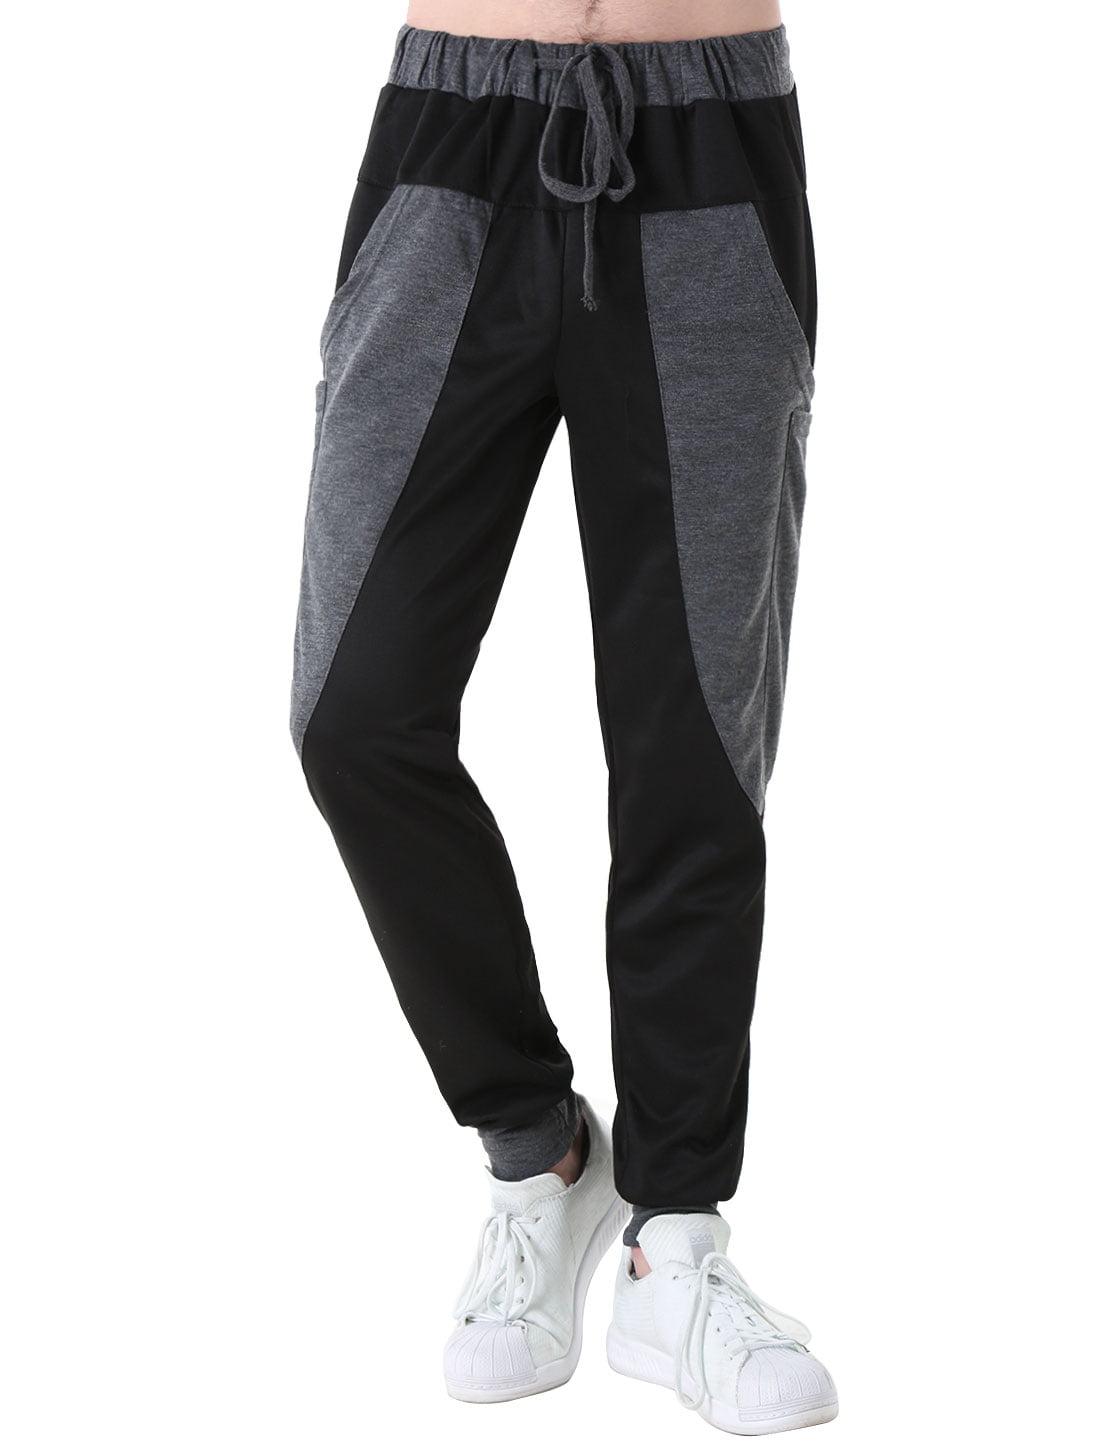 Big Hip Pockets Drawstring Trousers for Men